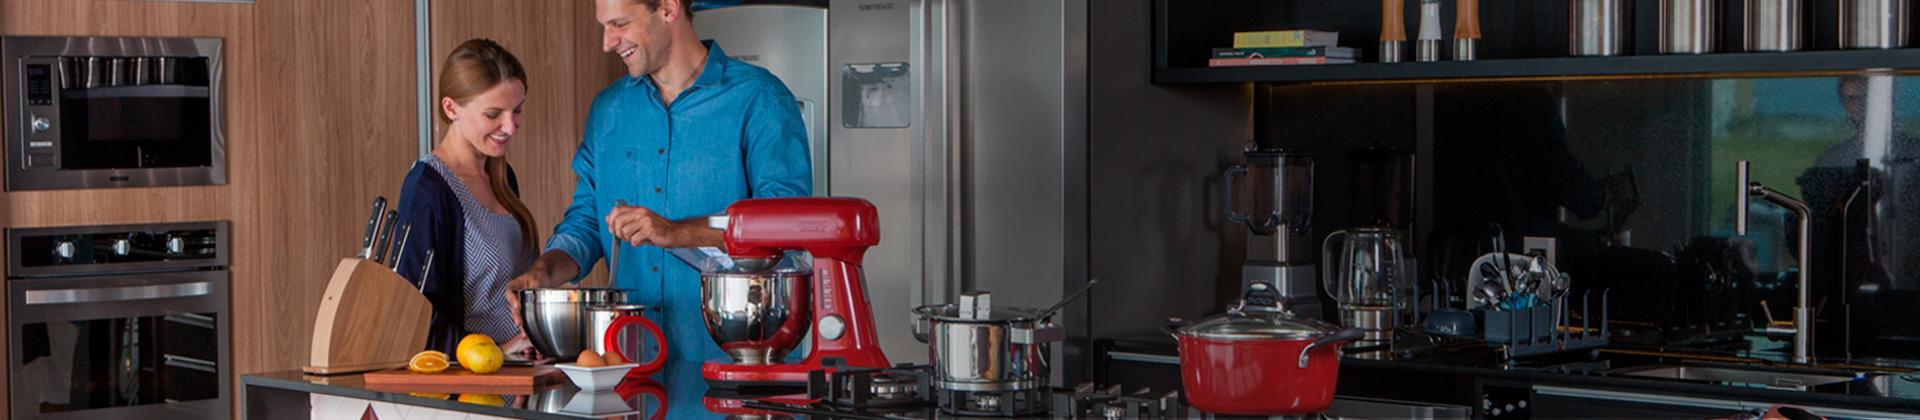 Banner Carrossel Categoria - Cocina